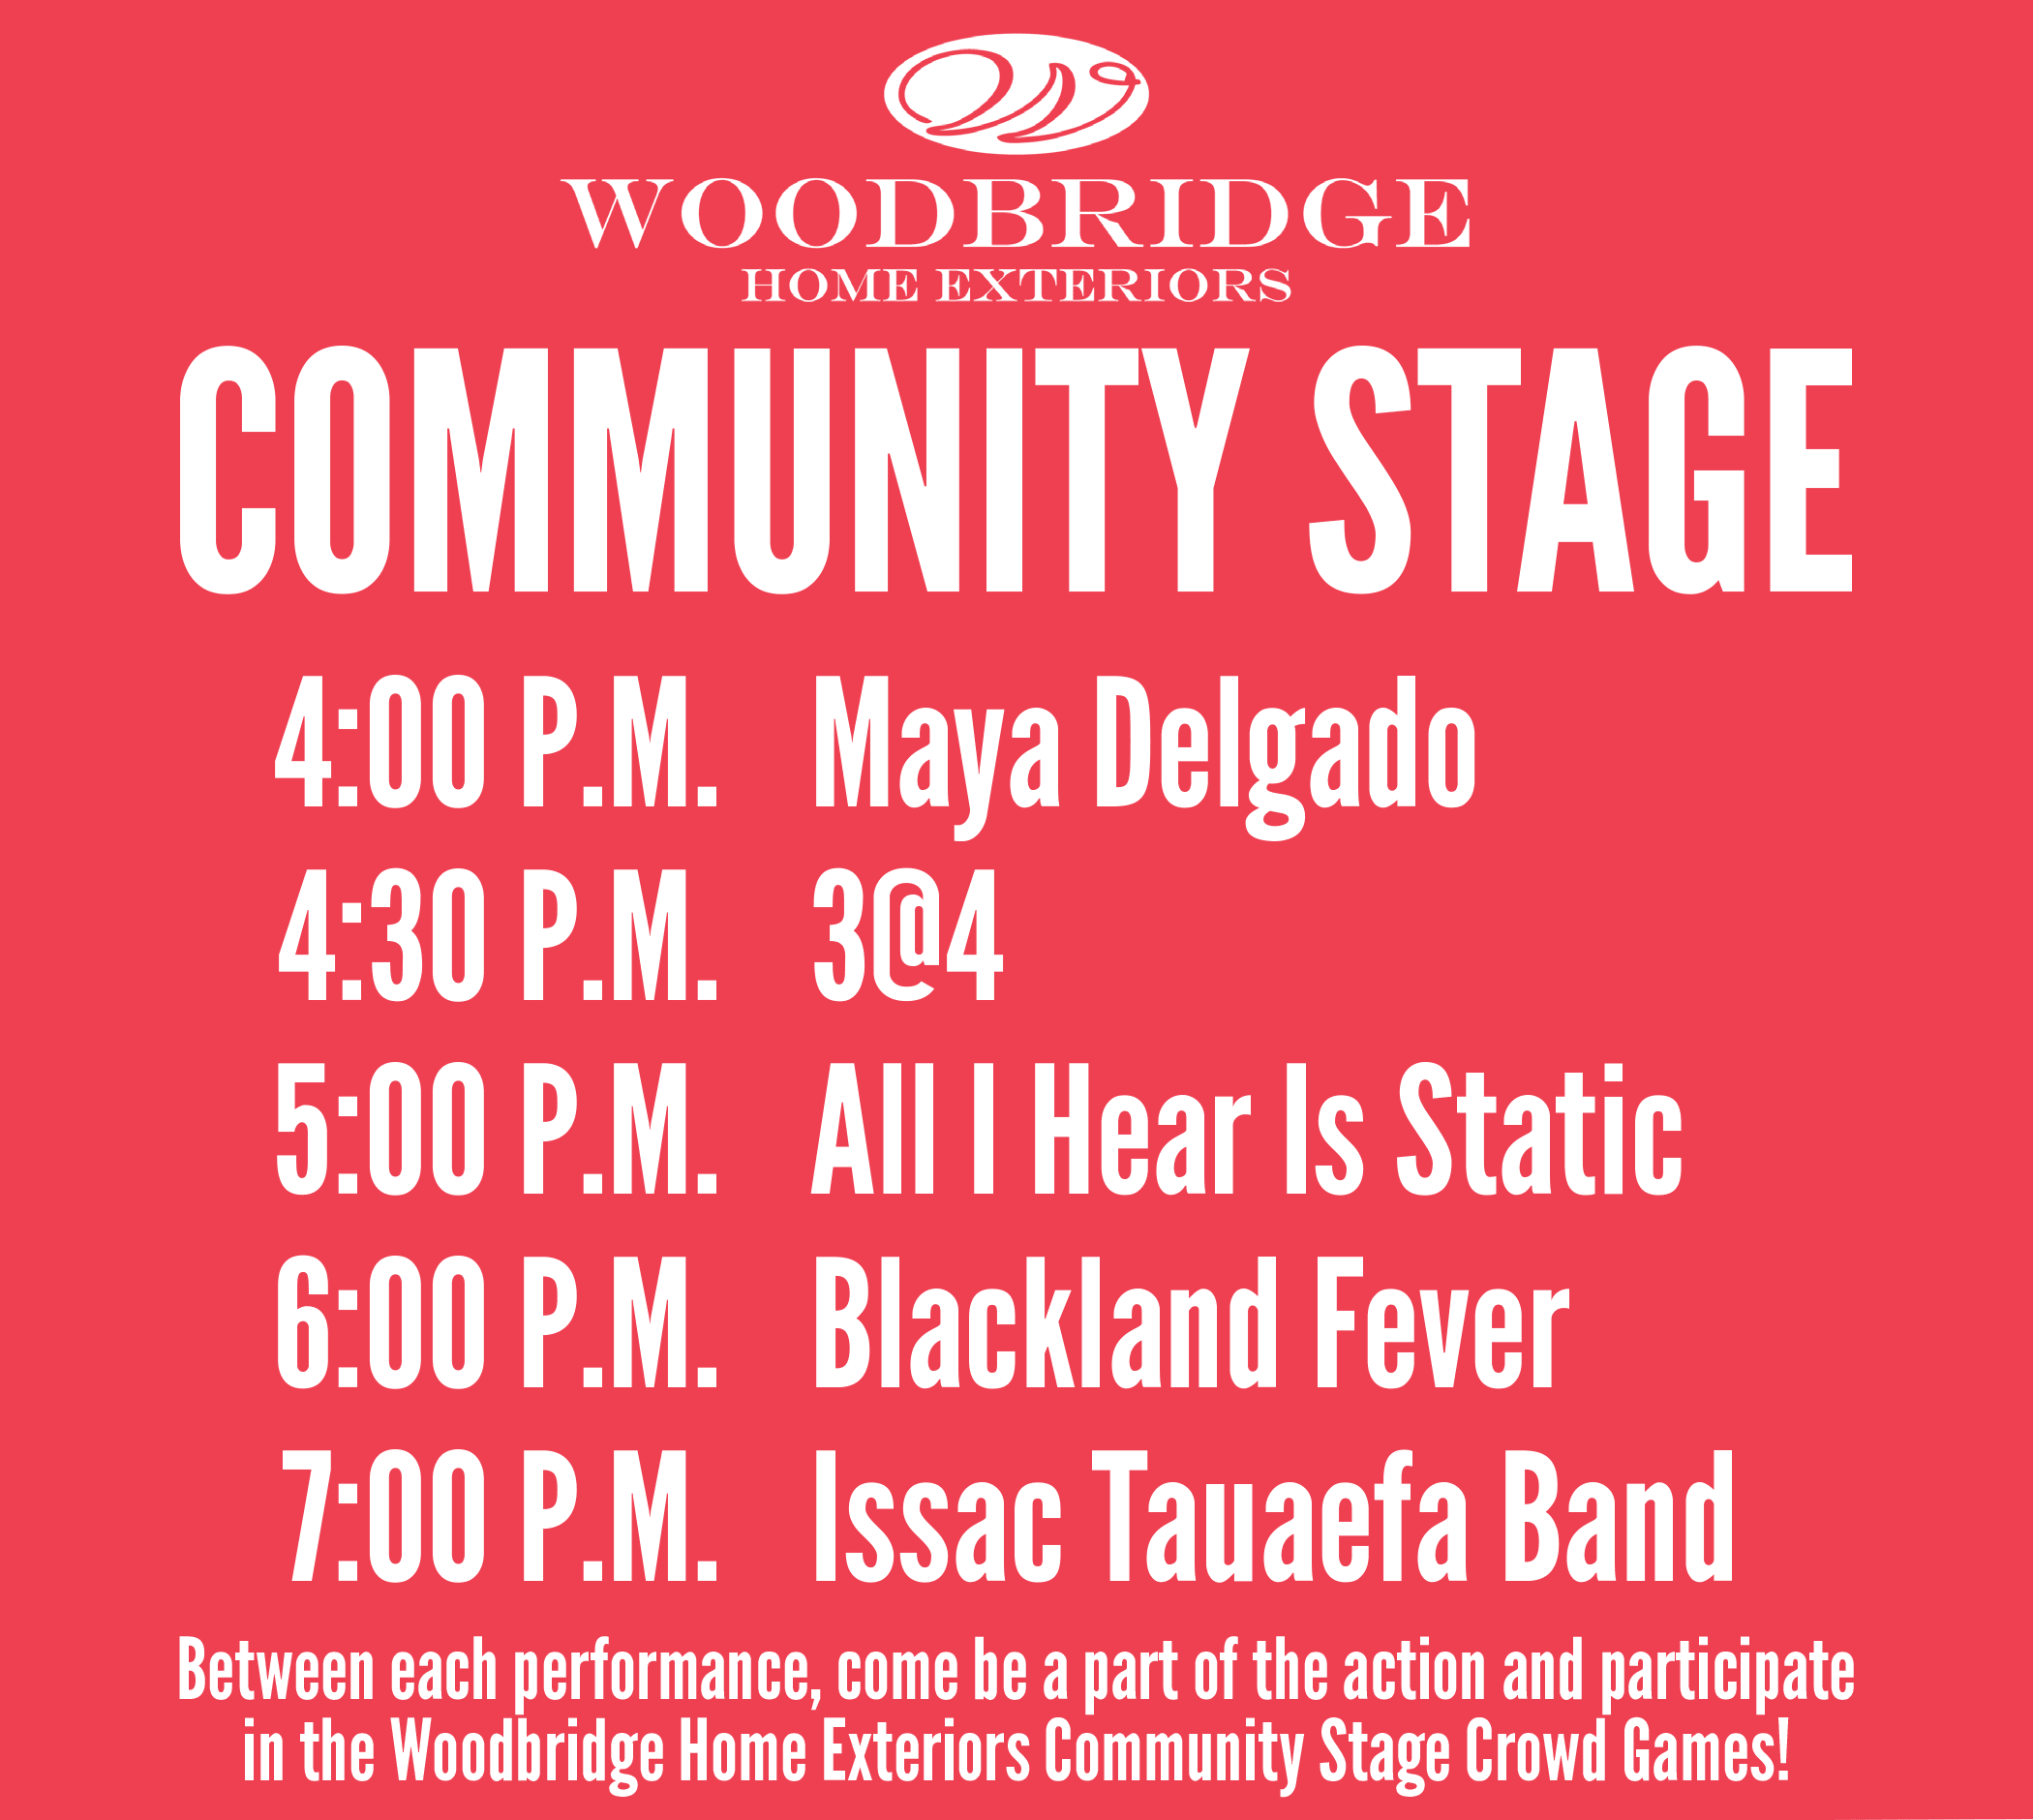 Woodbridge Home Exteriors Community Stage | Allen Special Events, TX